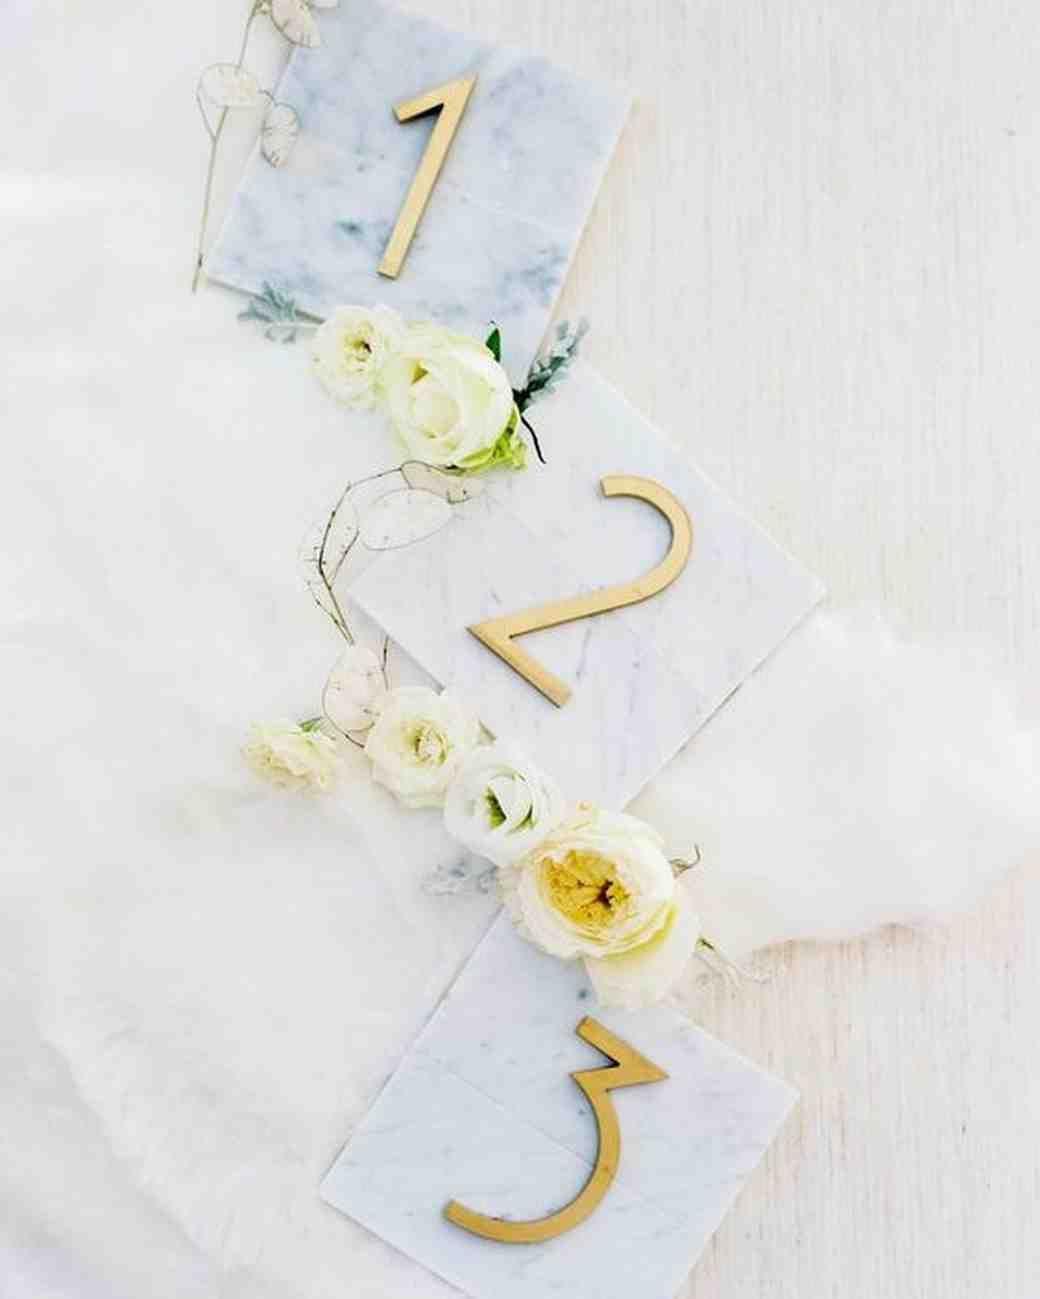 25 Unique Wedding Ideas To Get Inspire: Wedding Décor & Details